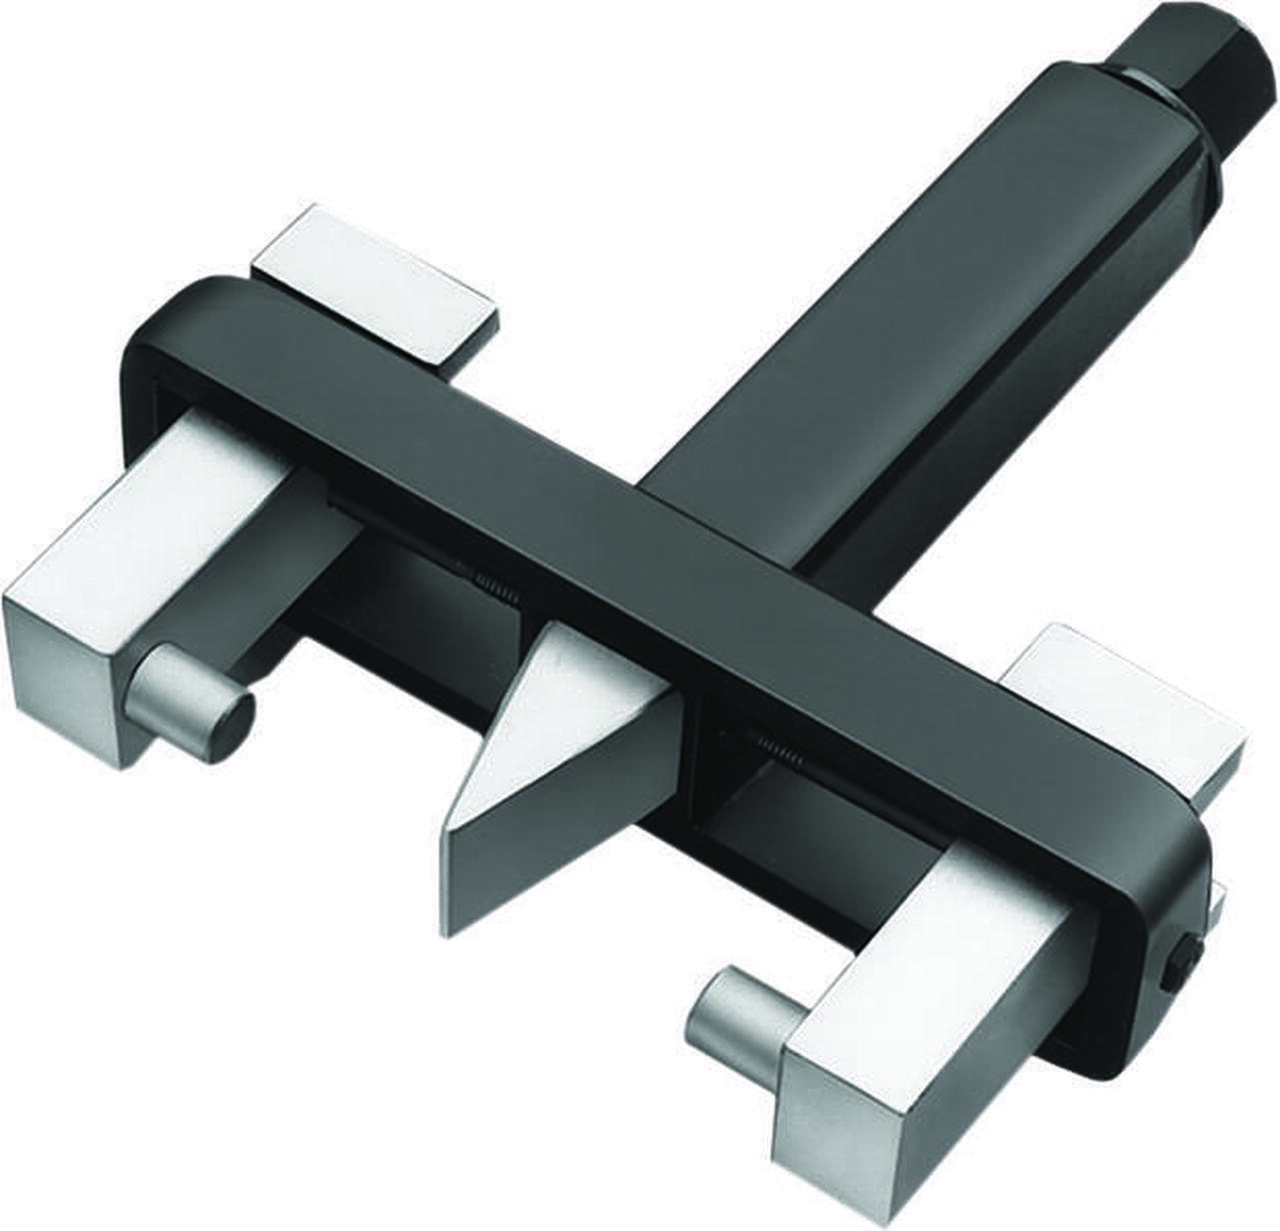 Mathey Dearman FIT-UP Pro Mechanical Flange Spreader - D100